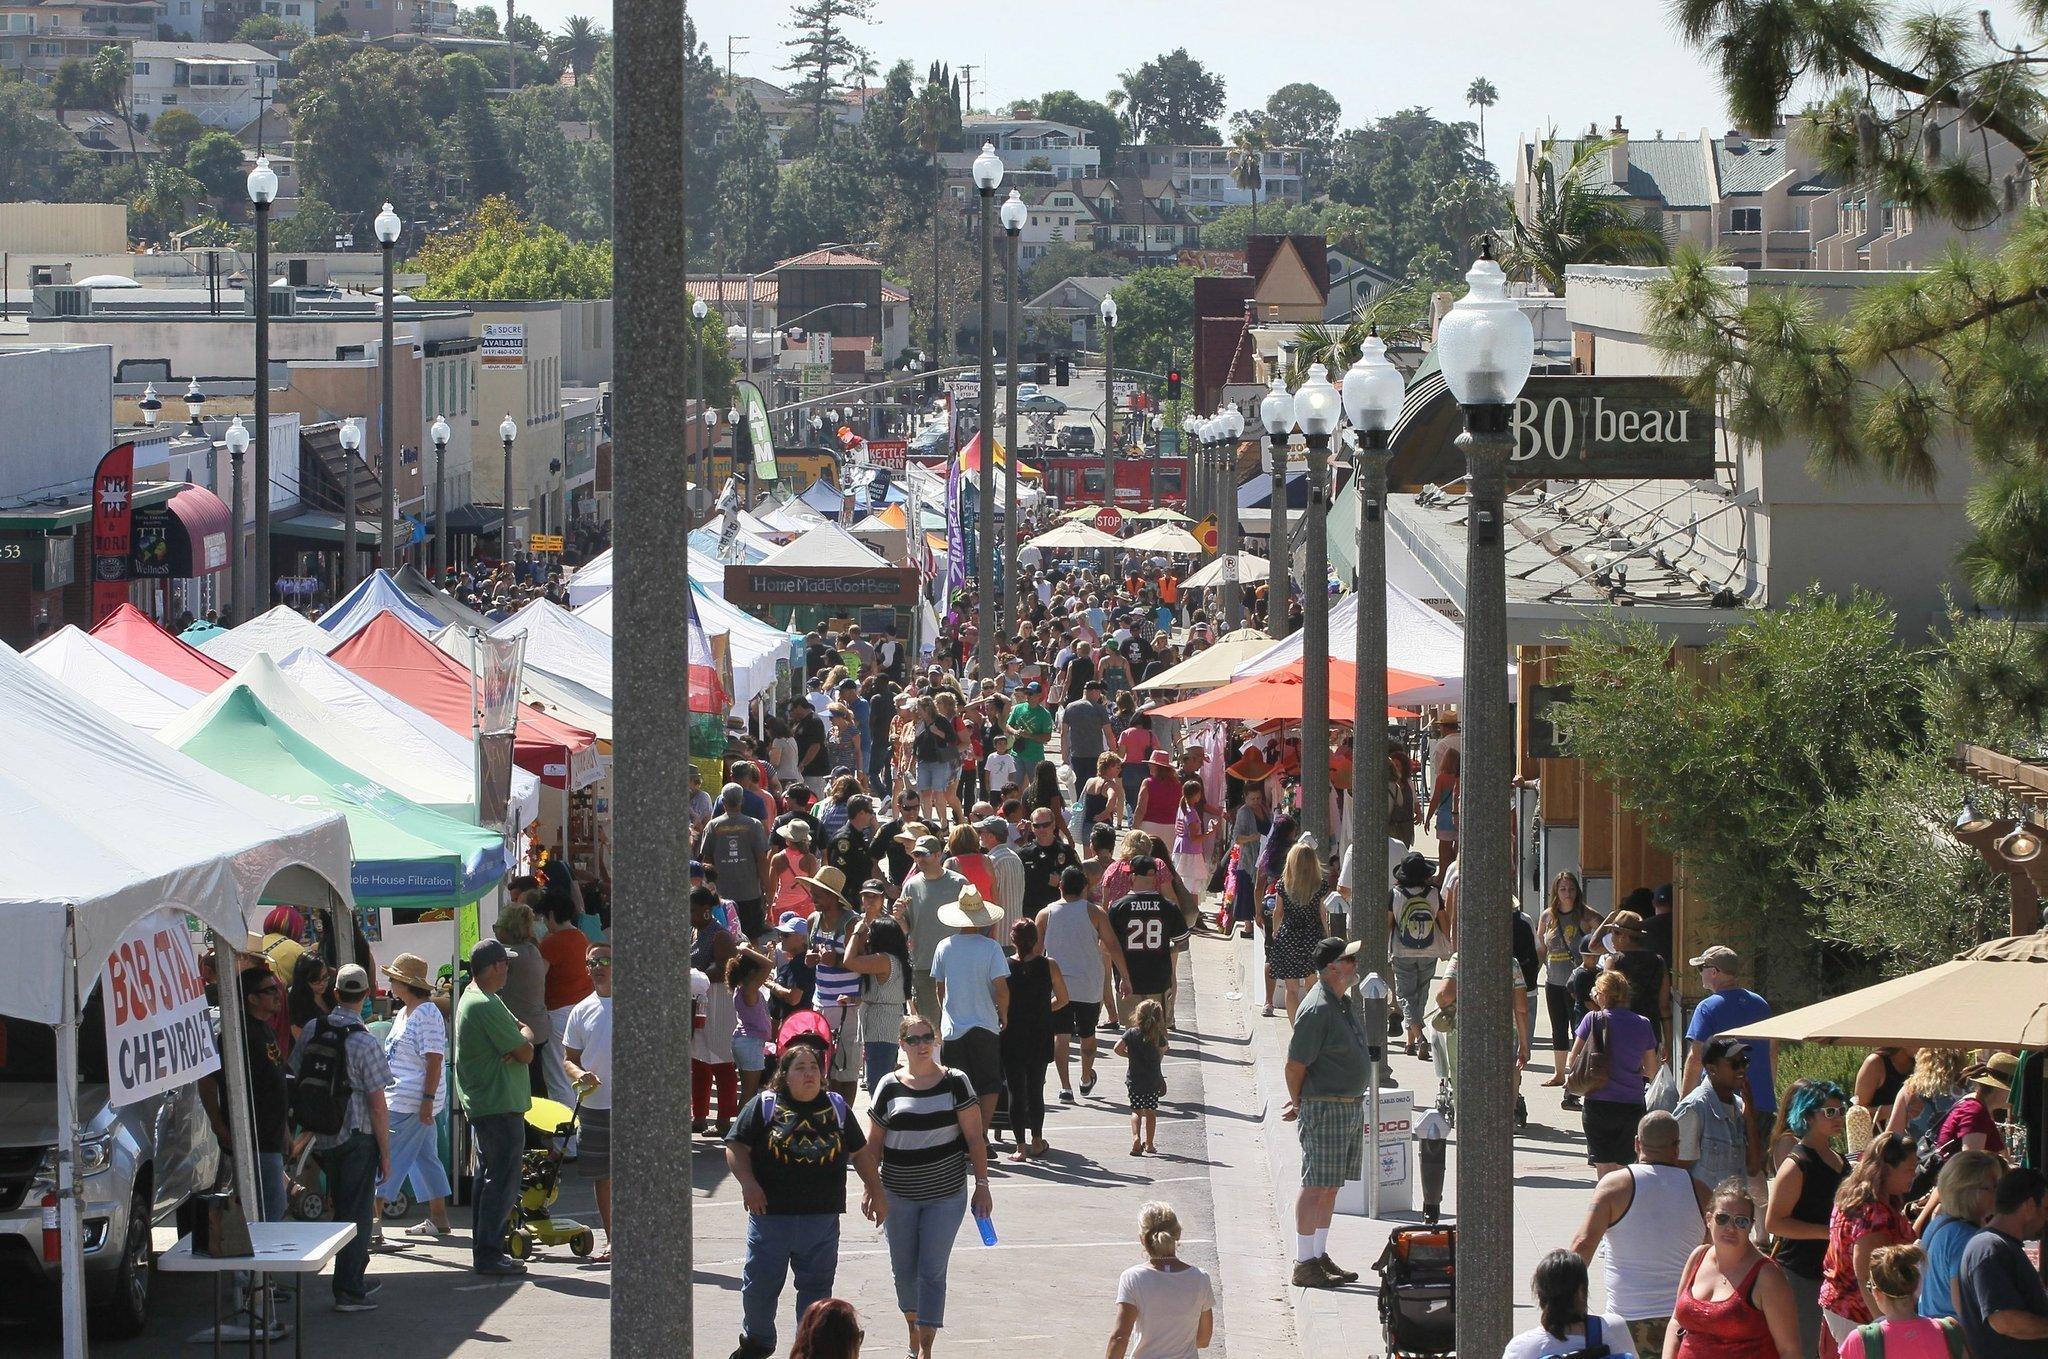 La Mesa Wants More German In Oktoberfest The San Diego